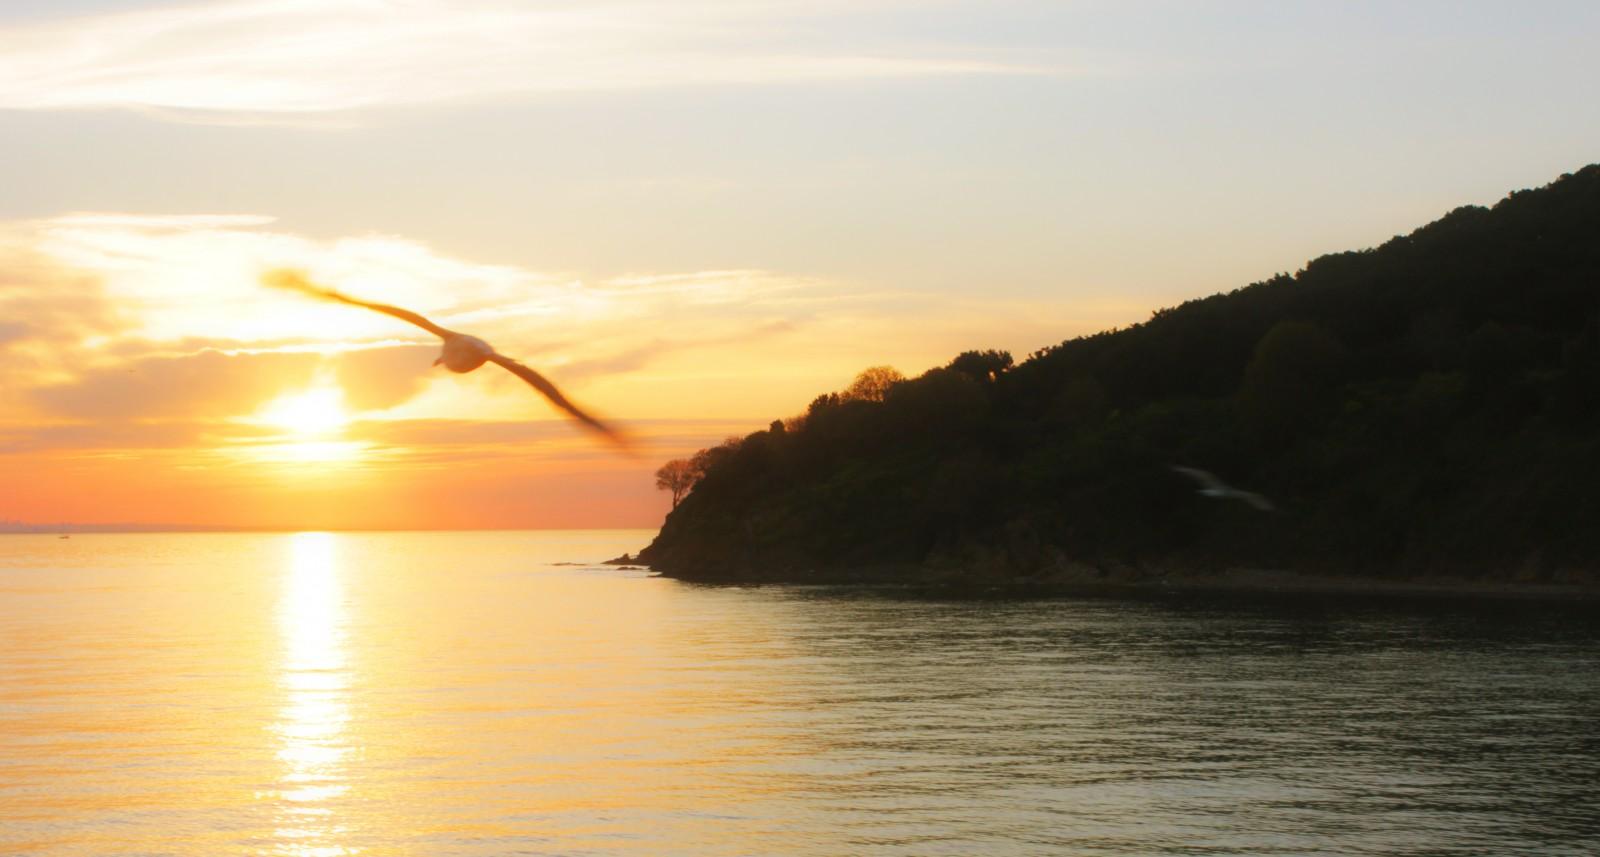 blue_light_sunset_sea_orange_sun_color_bird-1042921.jpg!d.jpg